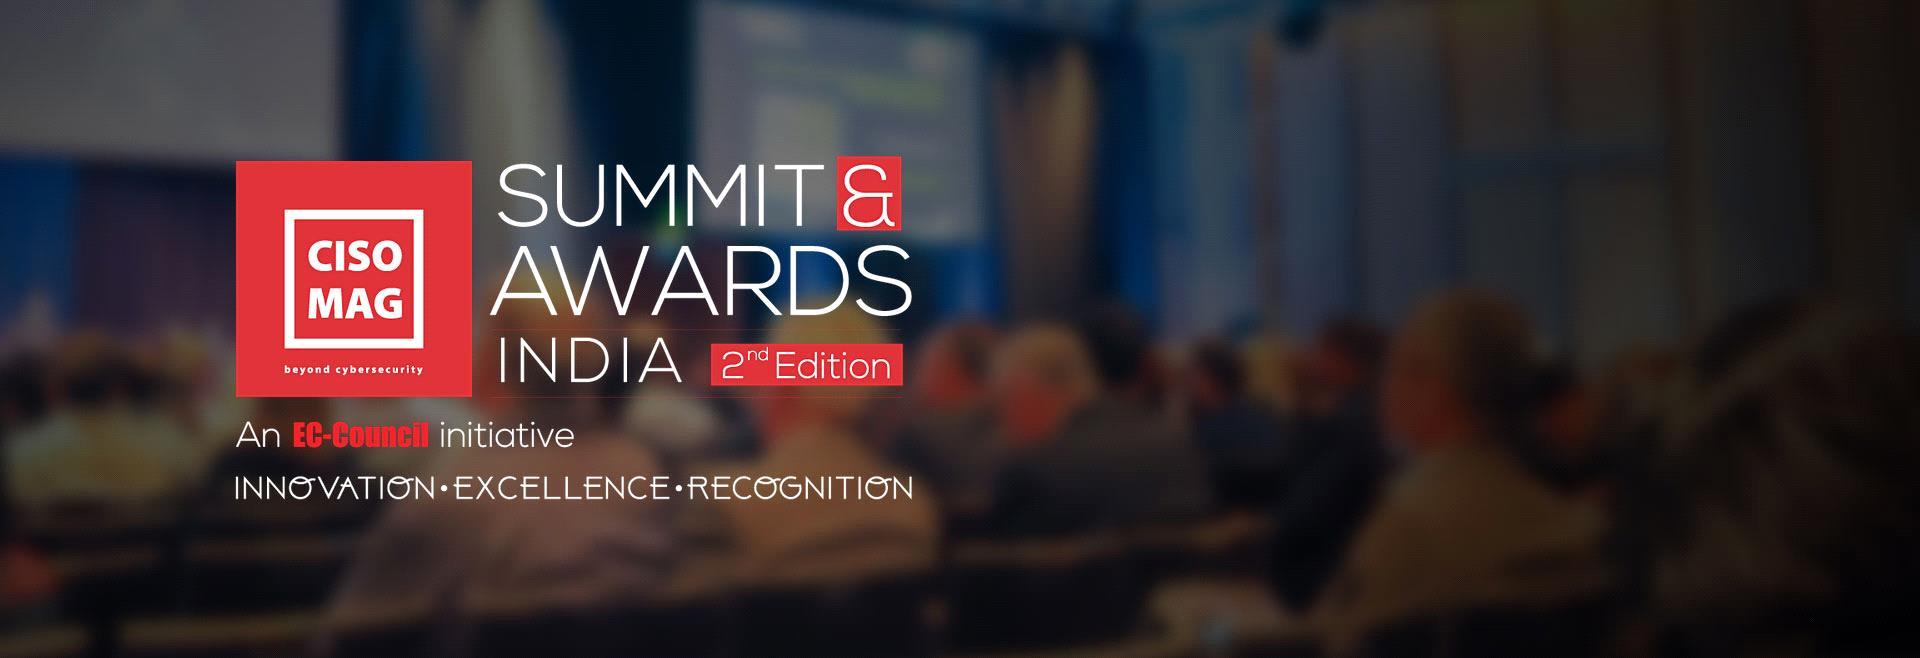 CISO MAG Summit & Awards INDIA 2020